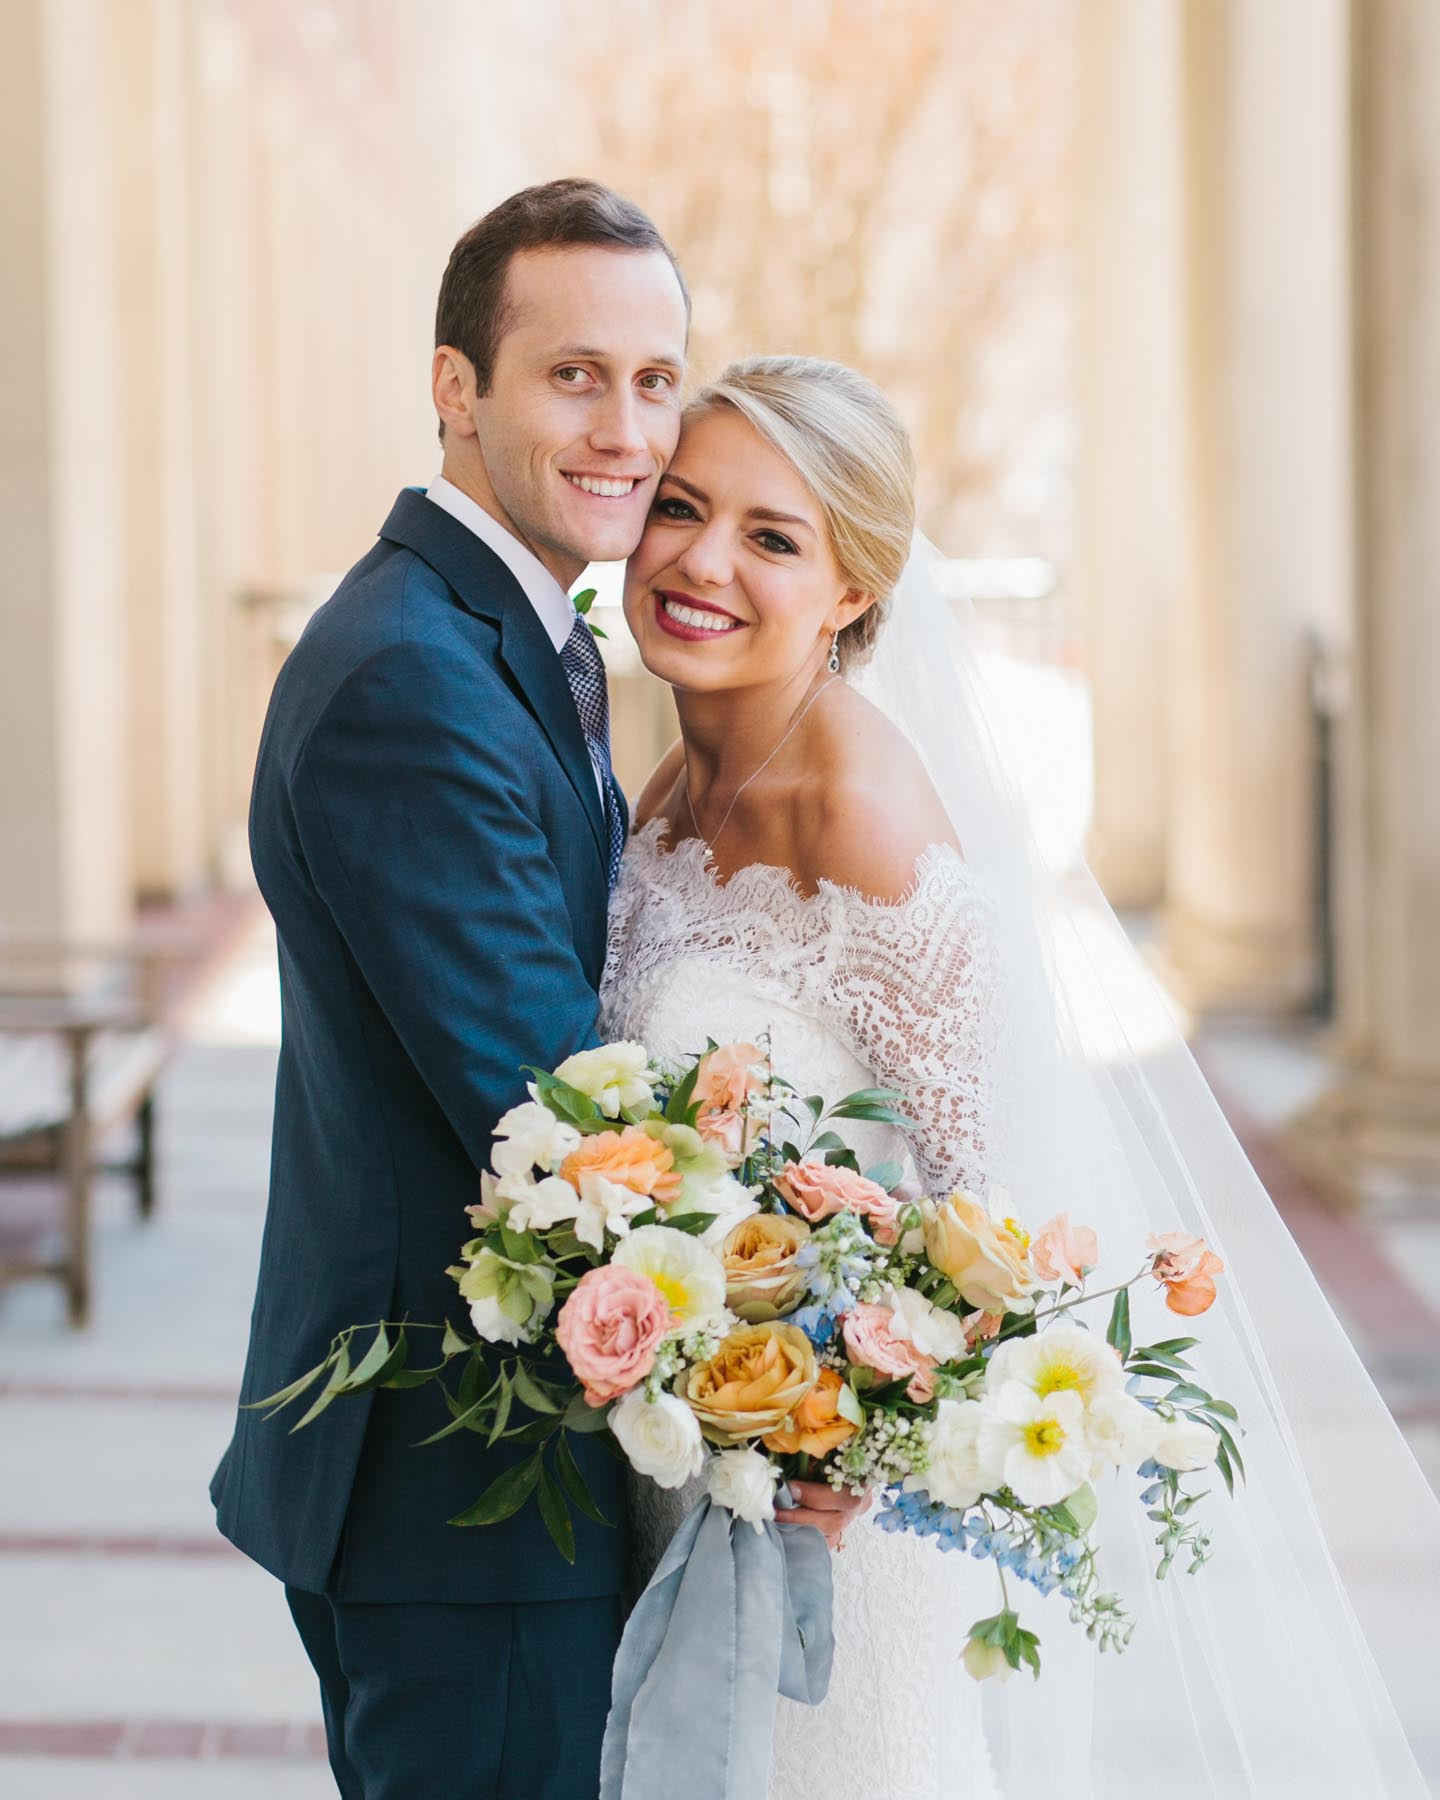 kjellman wedding blog biltmore wedding -37